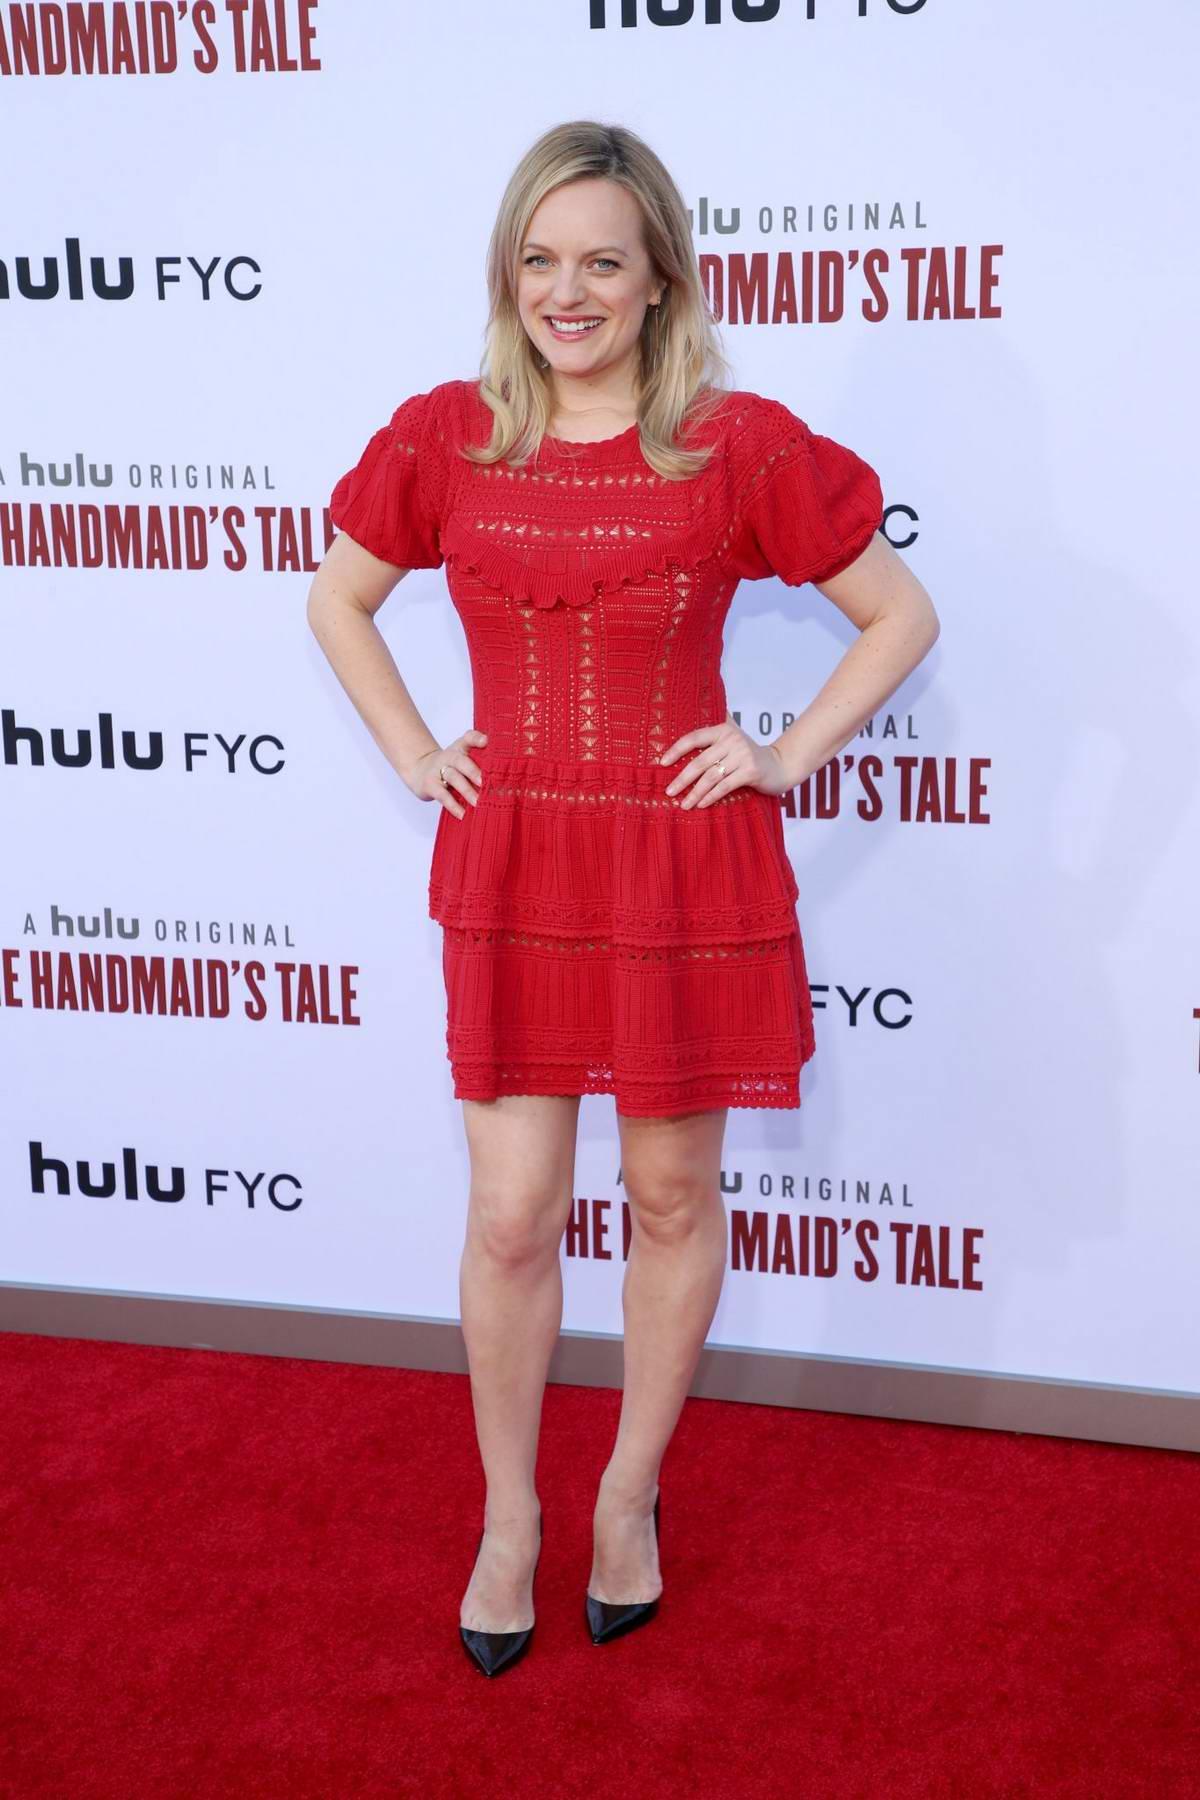 Elisabeth Moss attends 'The Handmaid's Tale' Season 3 Finale at Regency Village Theatre in Westwood, California